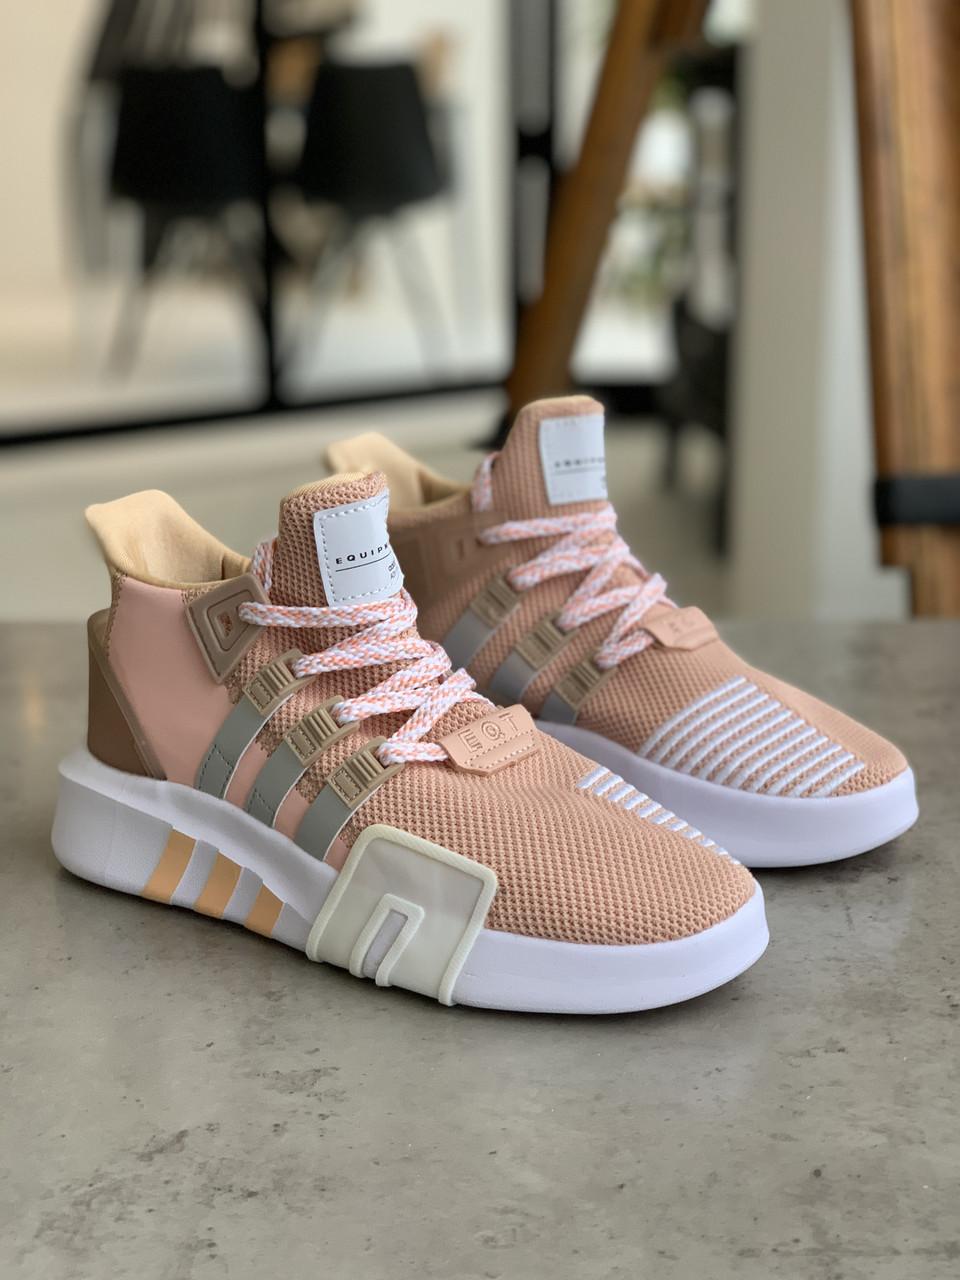 Кроссовки Adidas EQT Bask Adv Адидас Ект Баск [36,37,38,40]